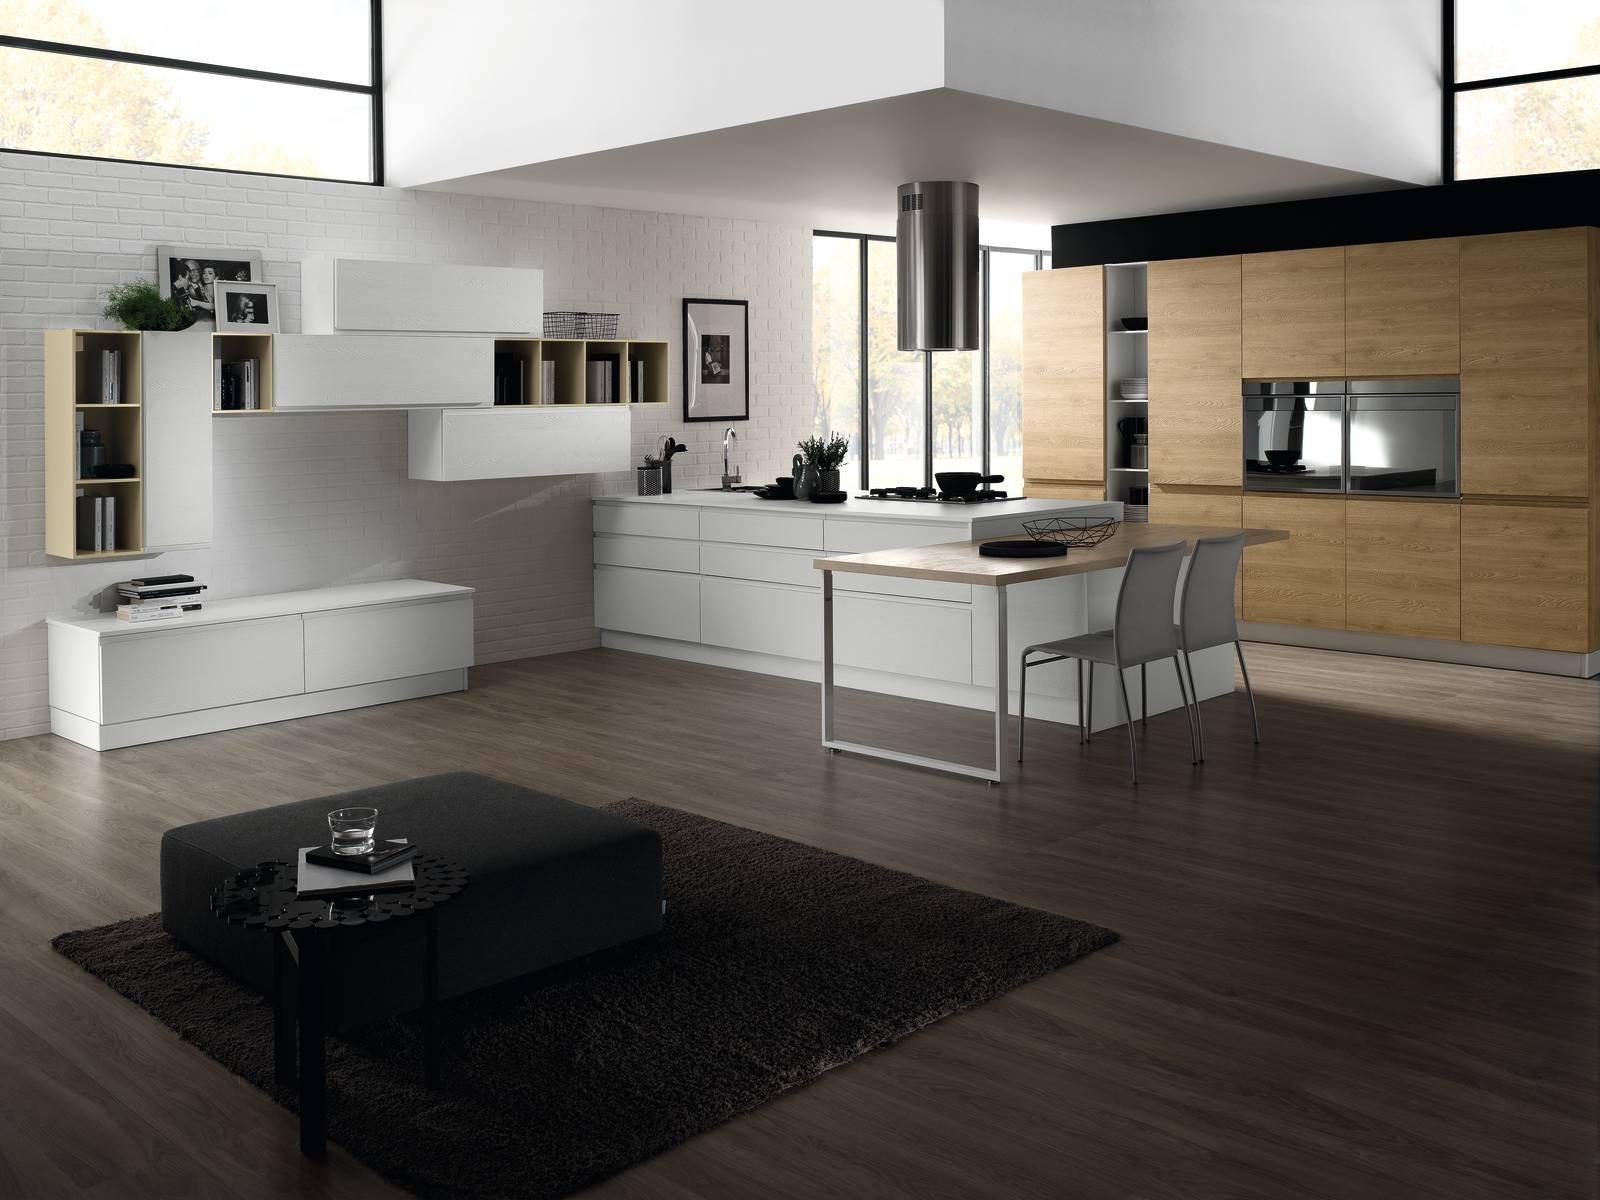 Cucina open space con isola open space con cucina ad isola foto stock rendering arredamento - Cucina open space con isola ...